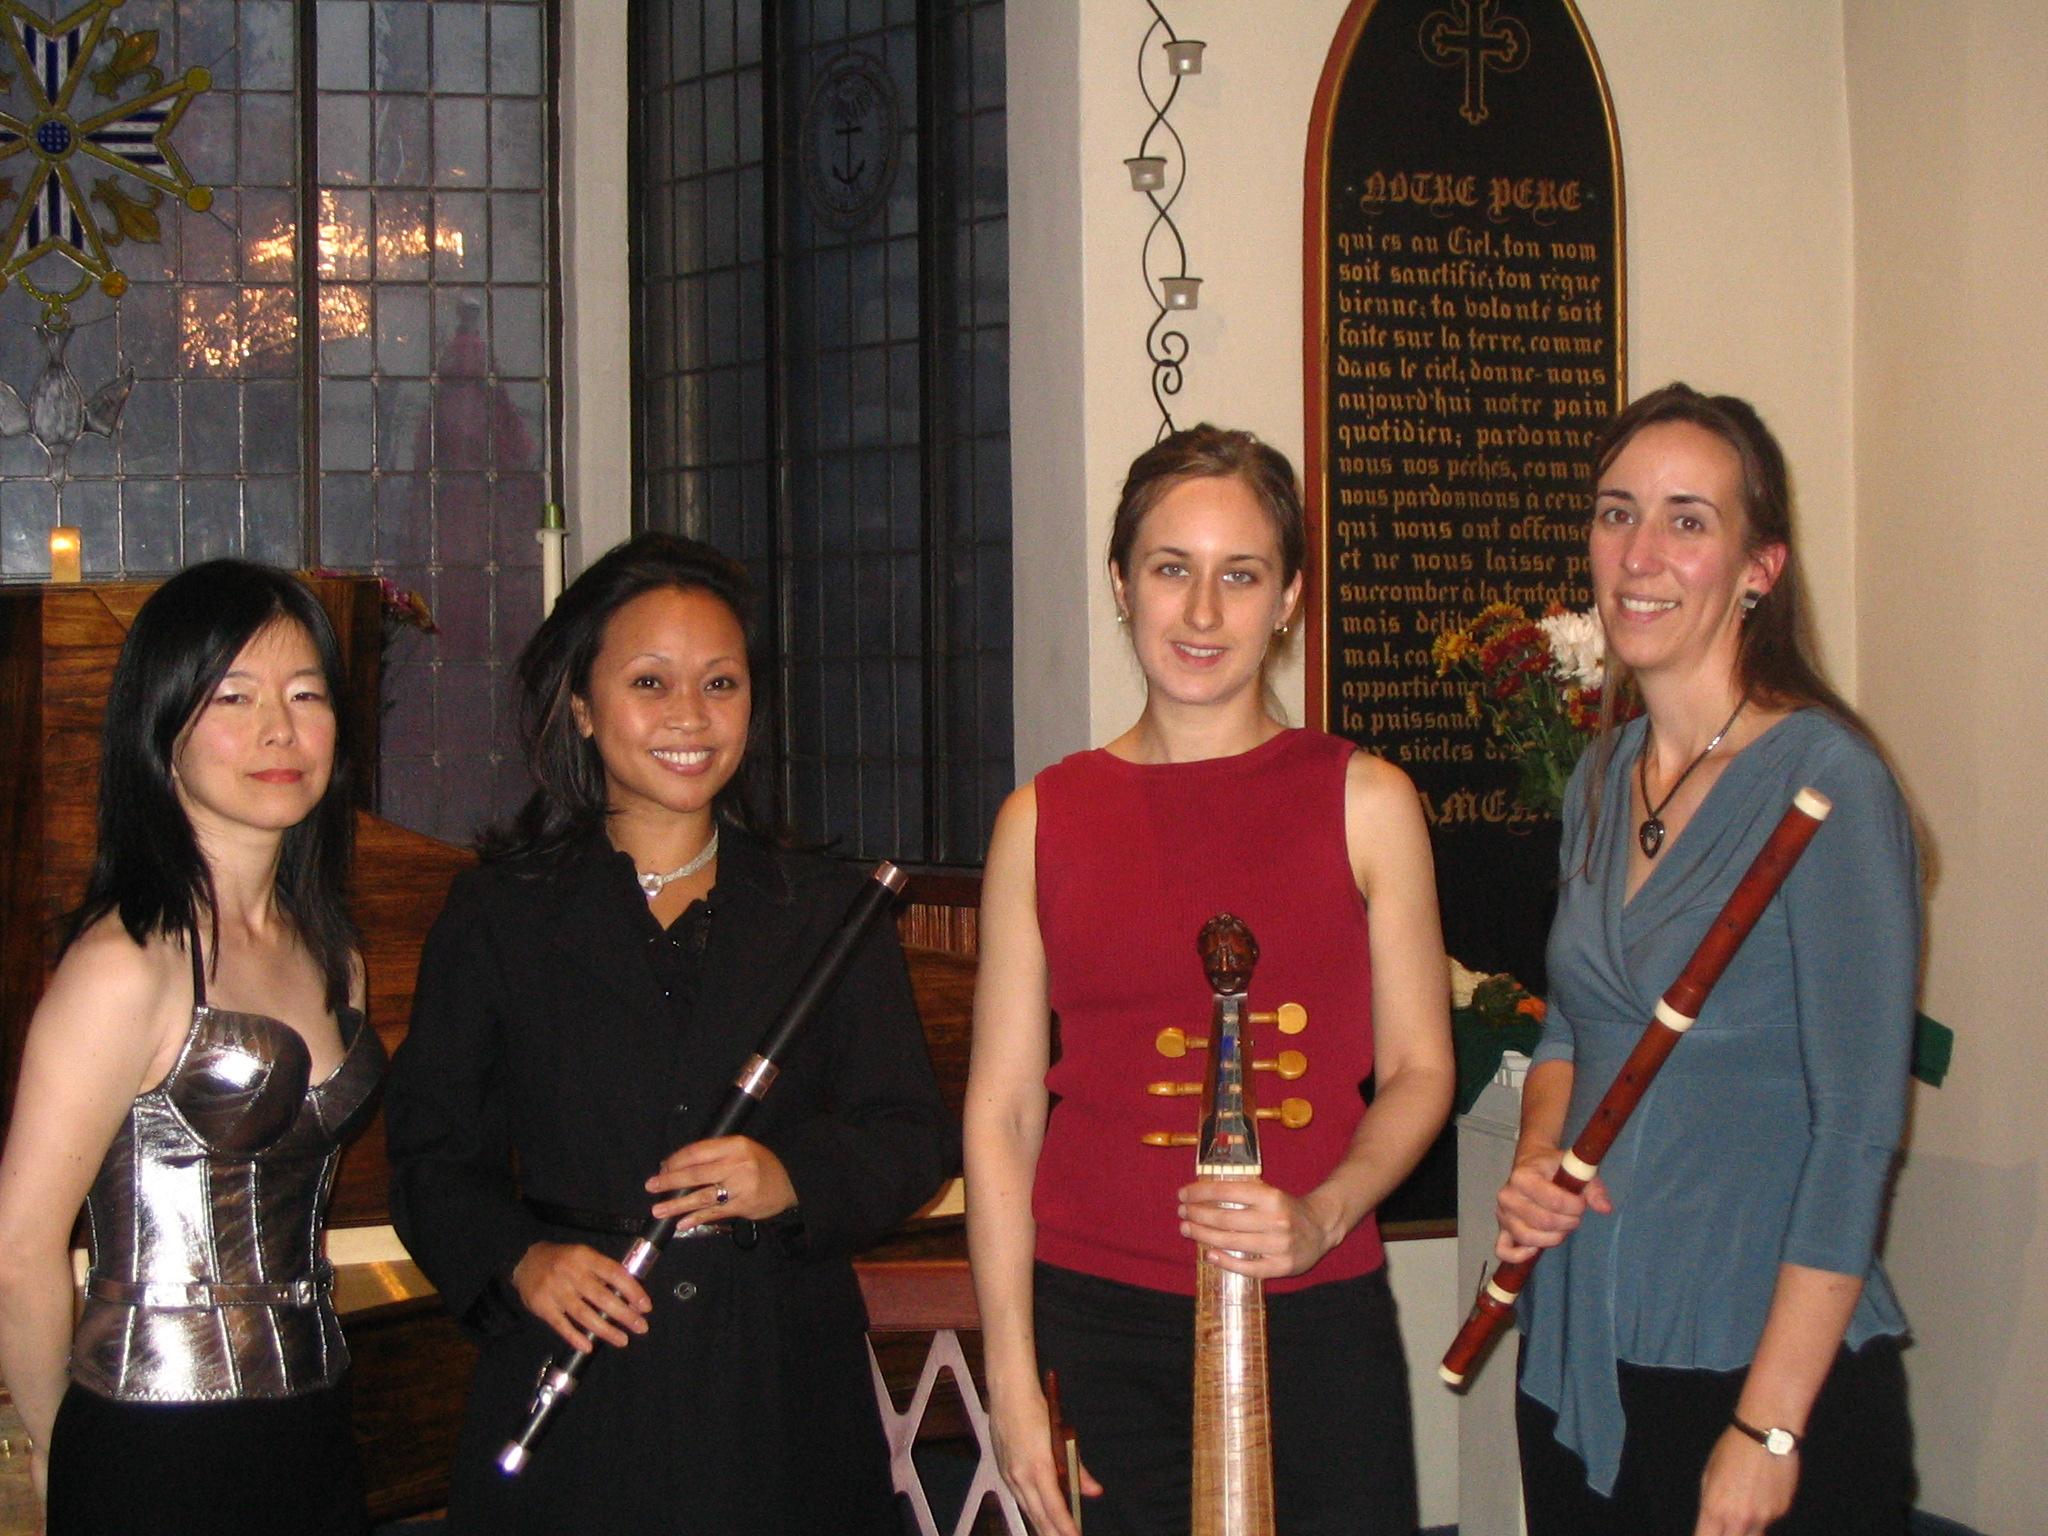 Nancy Kito (harpsichord), Elaine Vivar Camin (flute), Jessica Powell, (gamba), Susan Graham (flute)